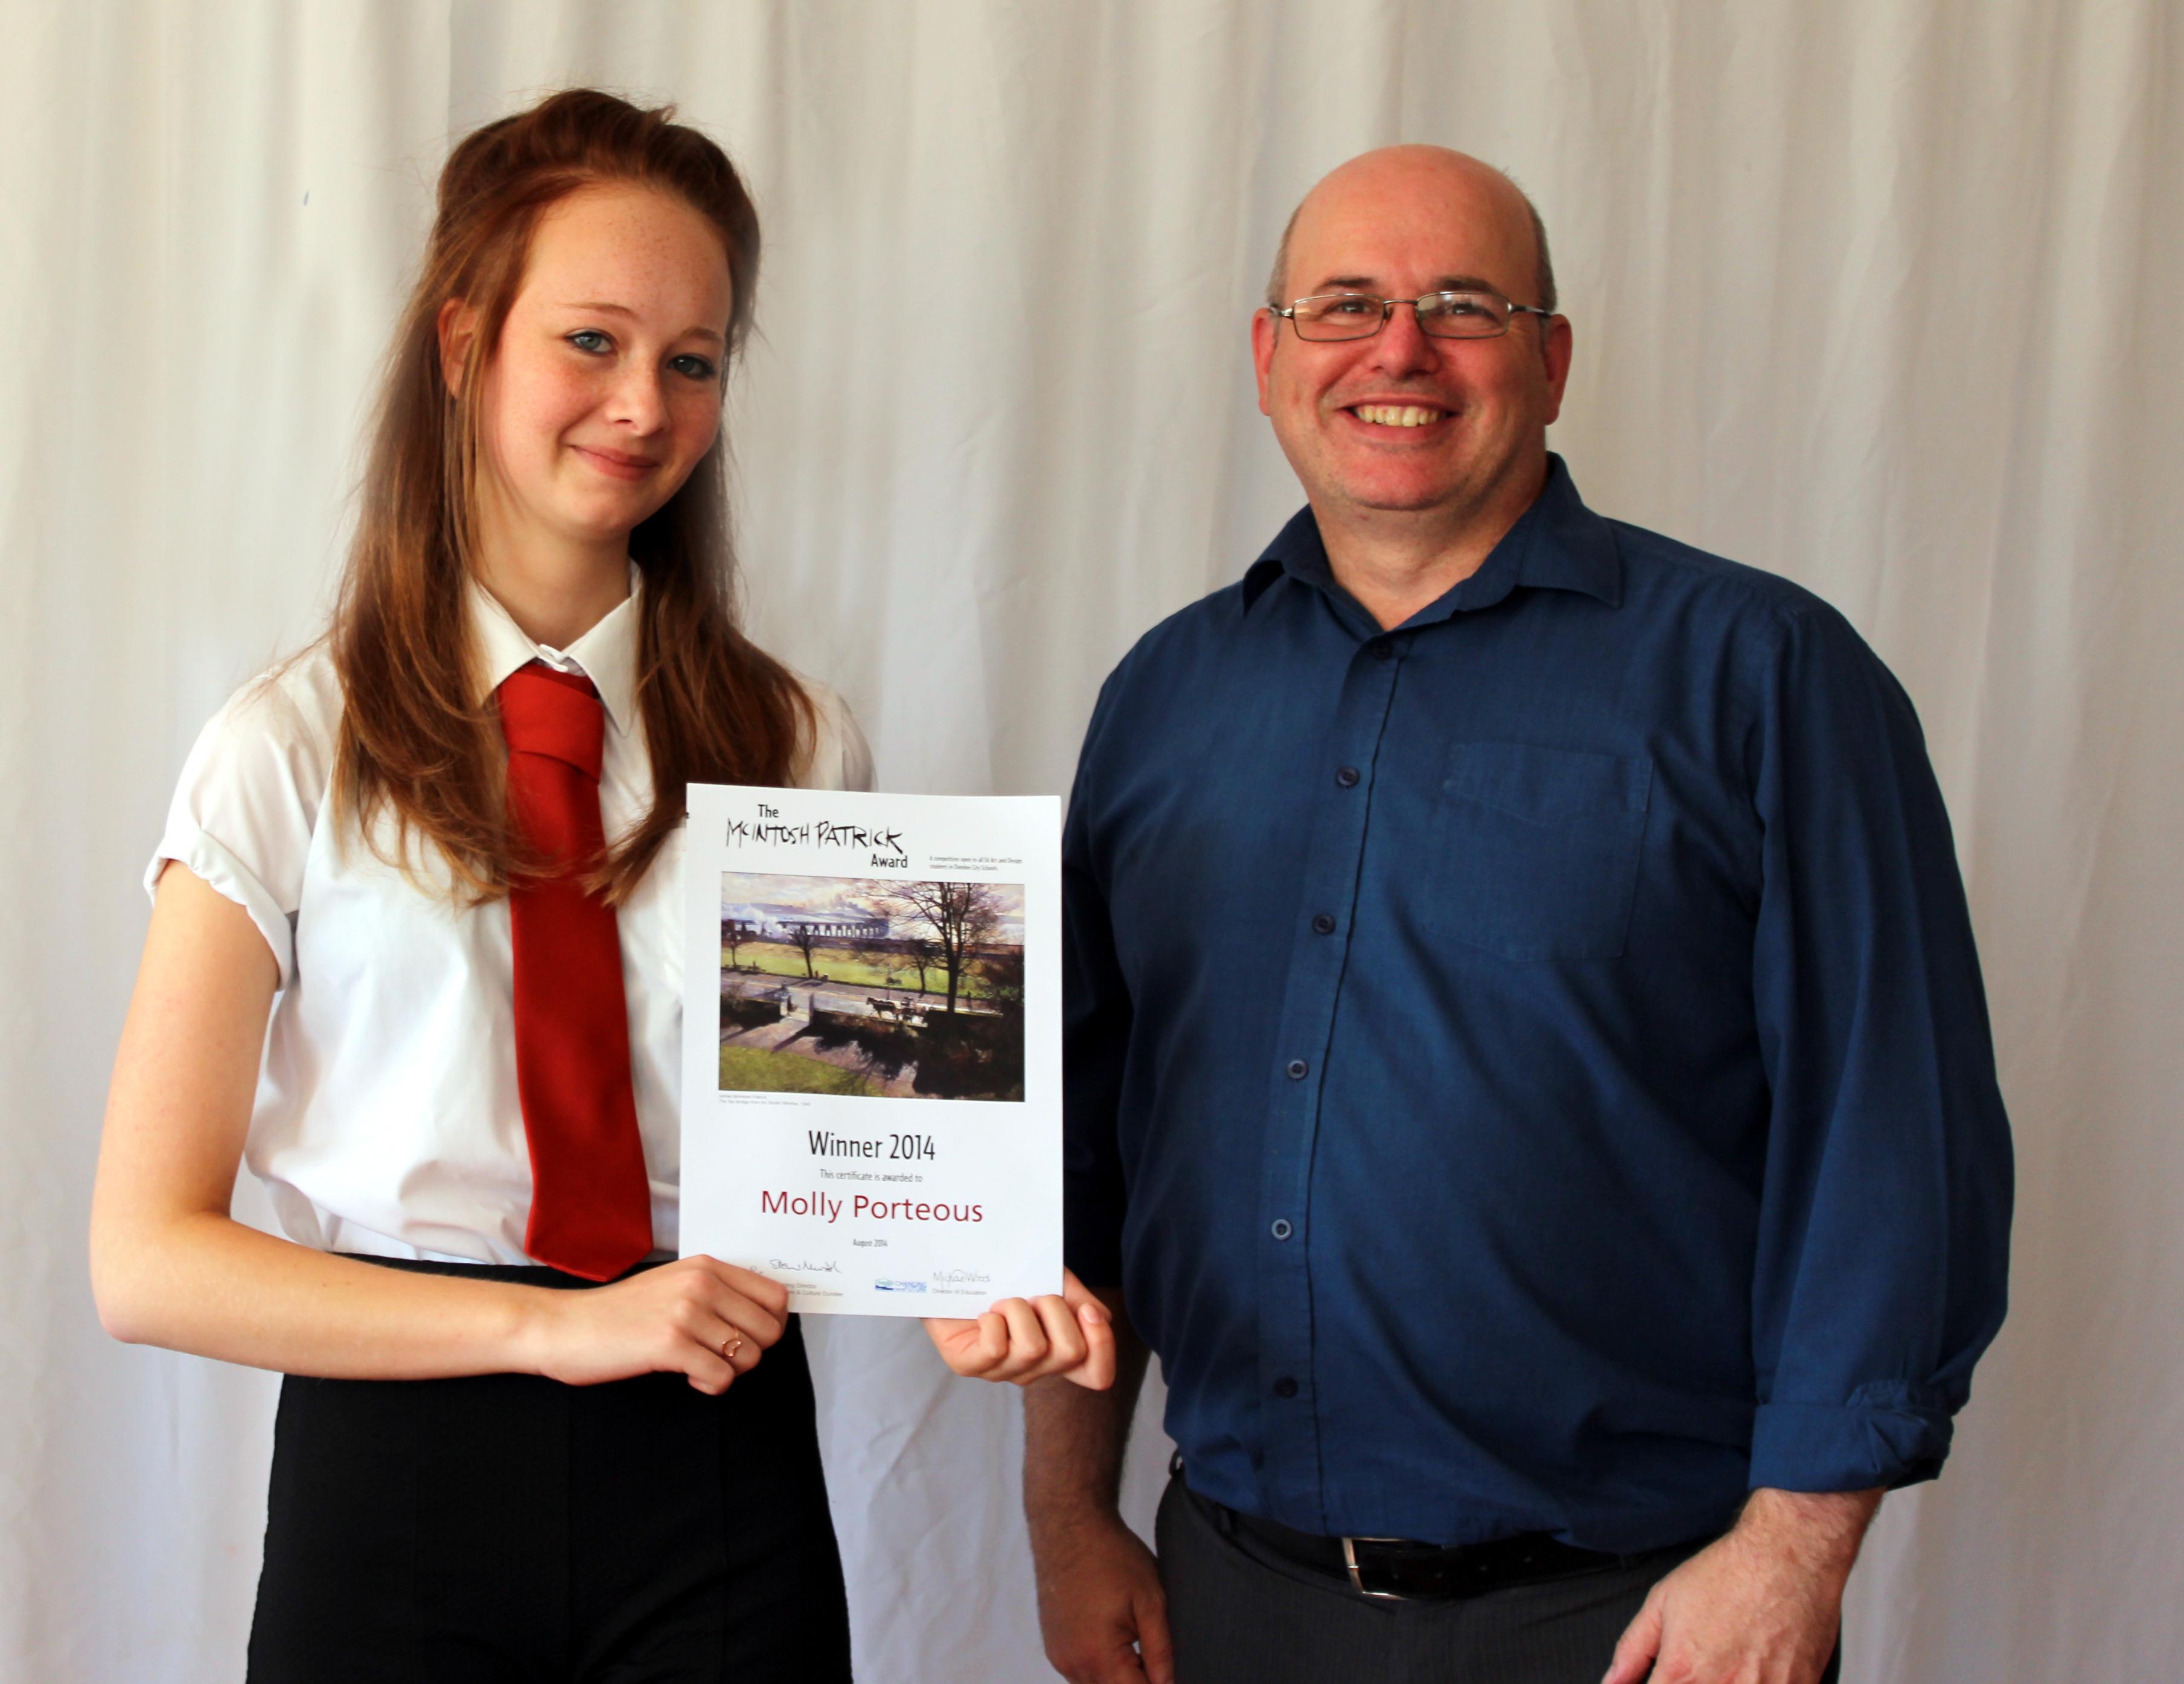 Molly wins McIntosh Patrick Award